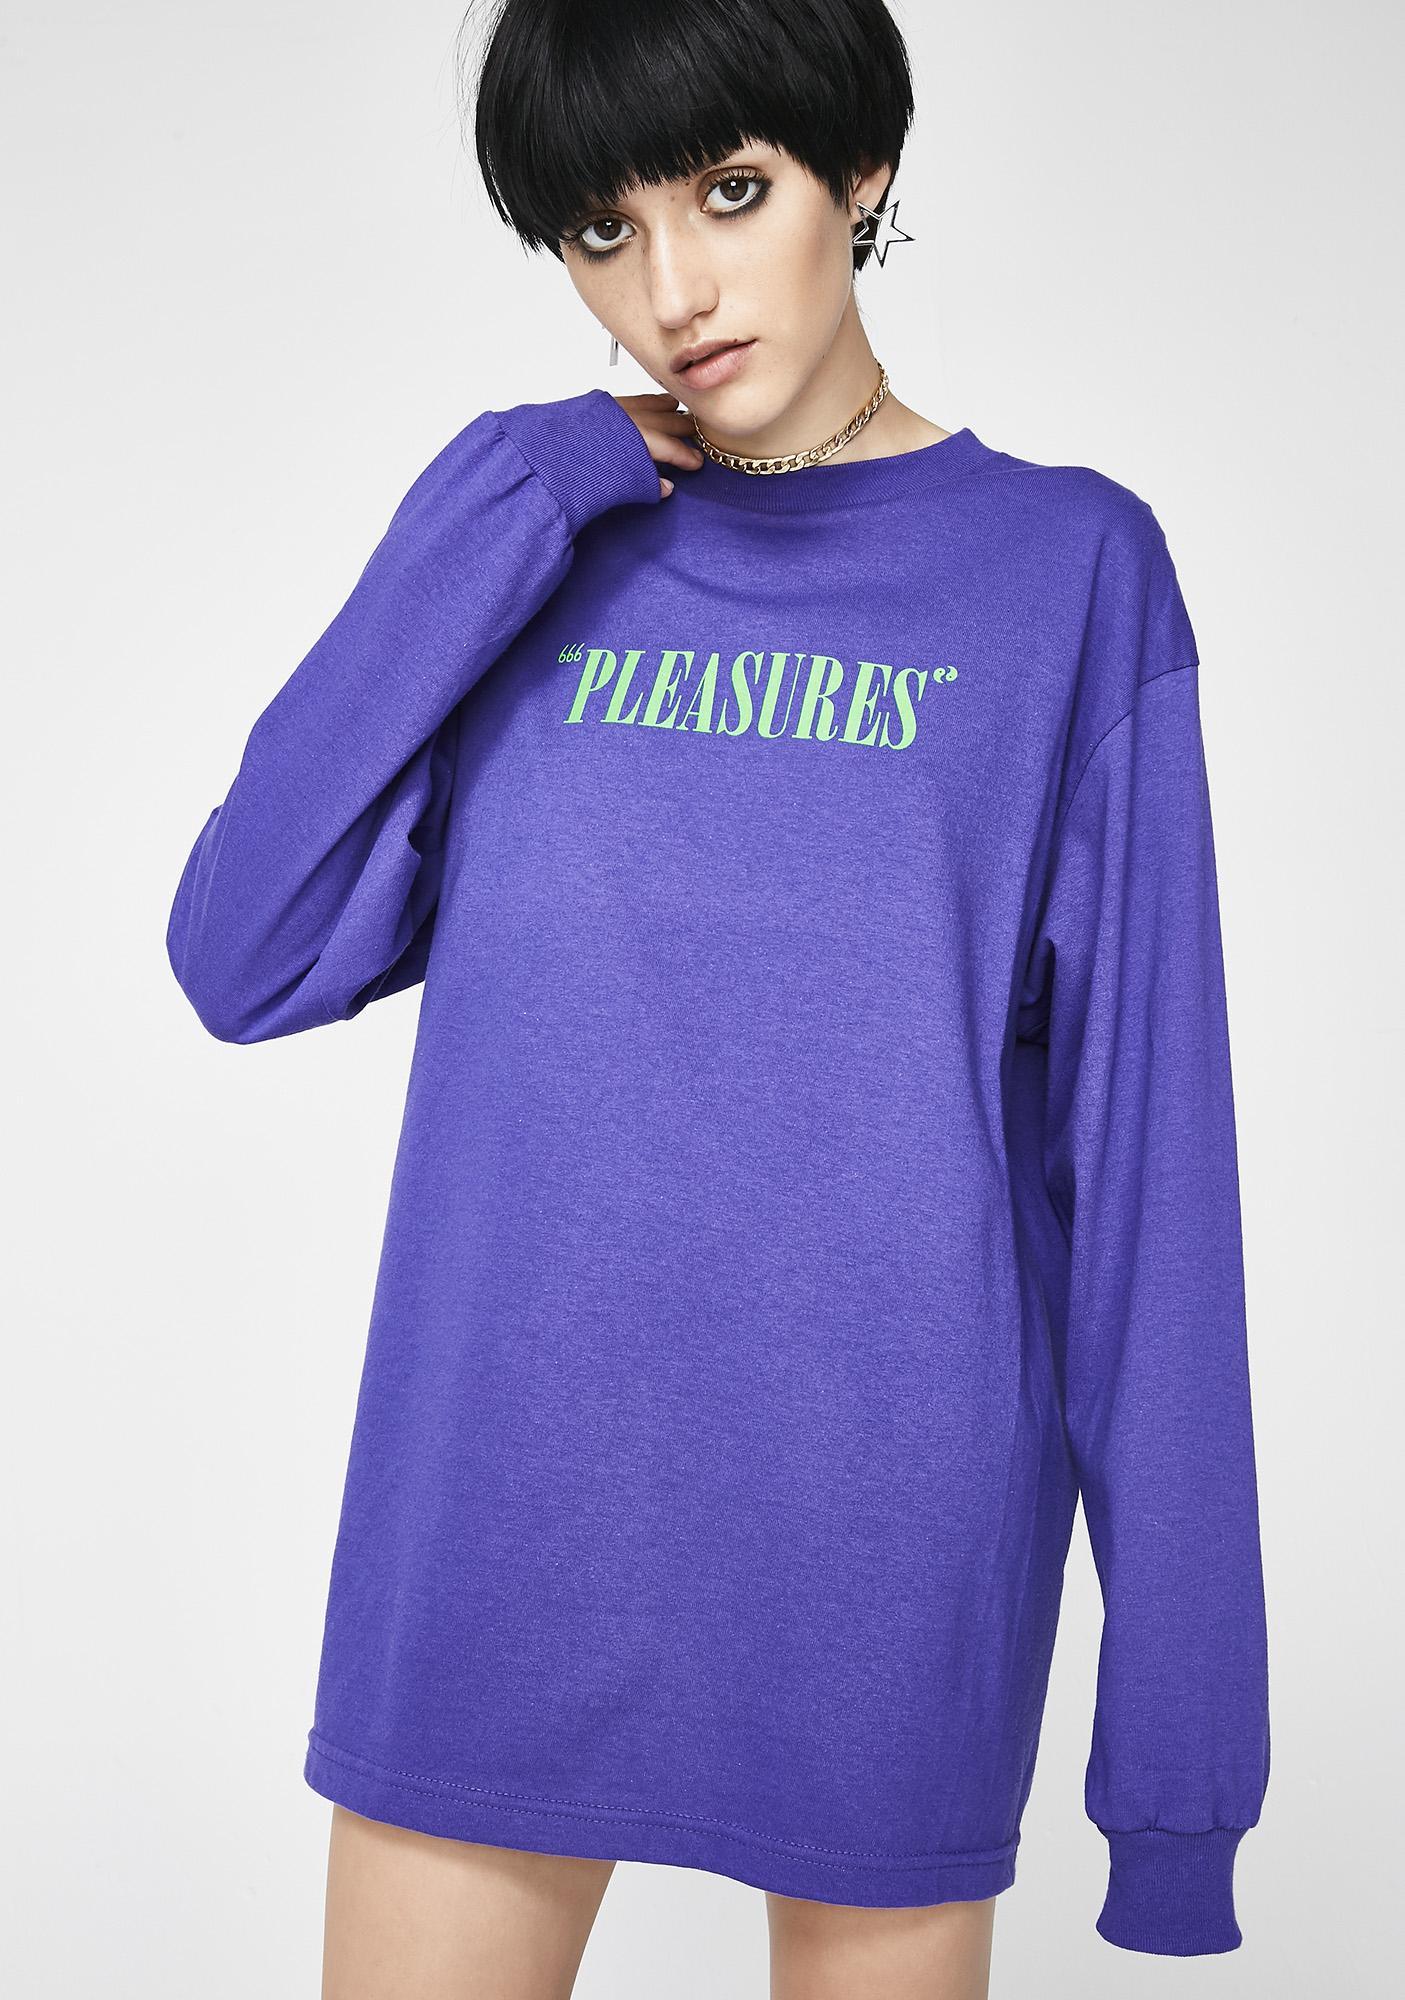 Pleasures Mark Of The Beast Long Sleeve T-Shirt